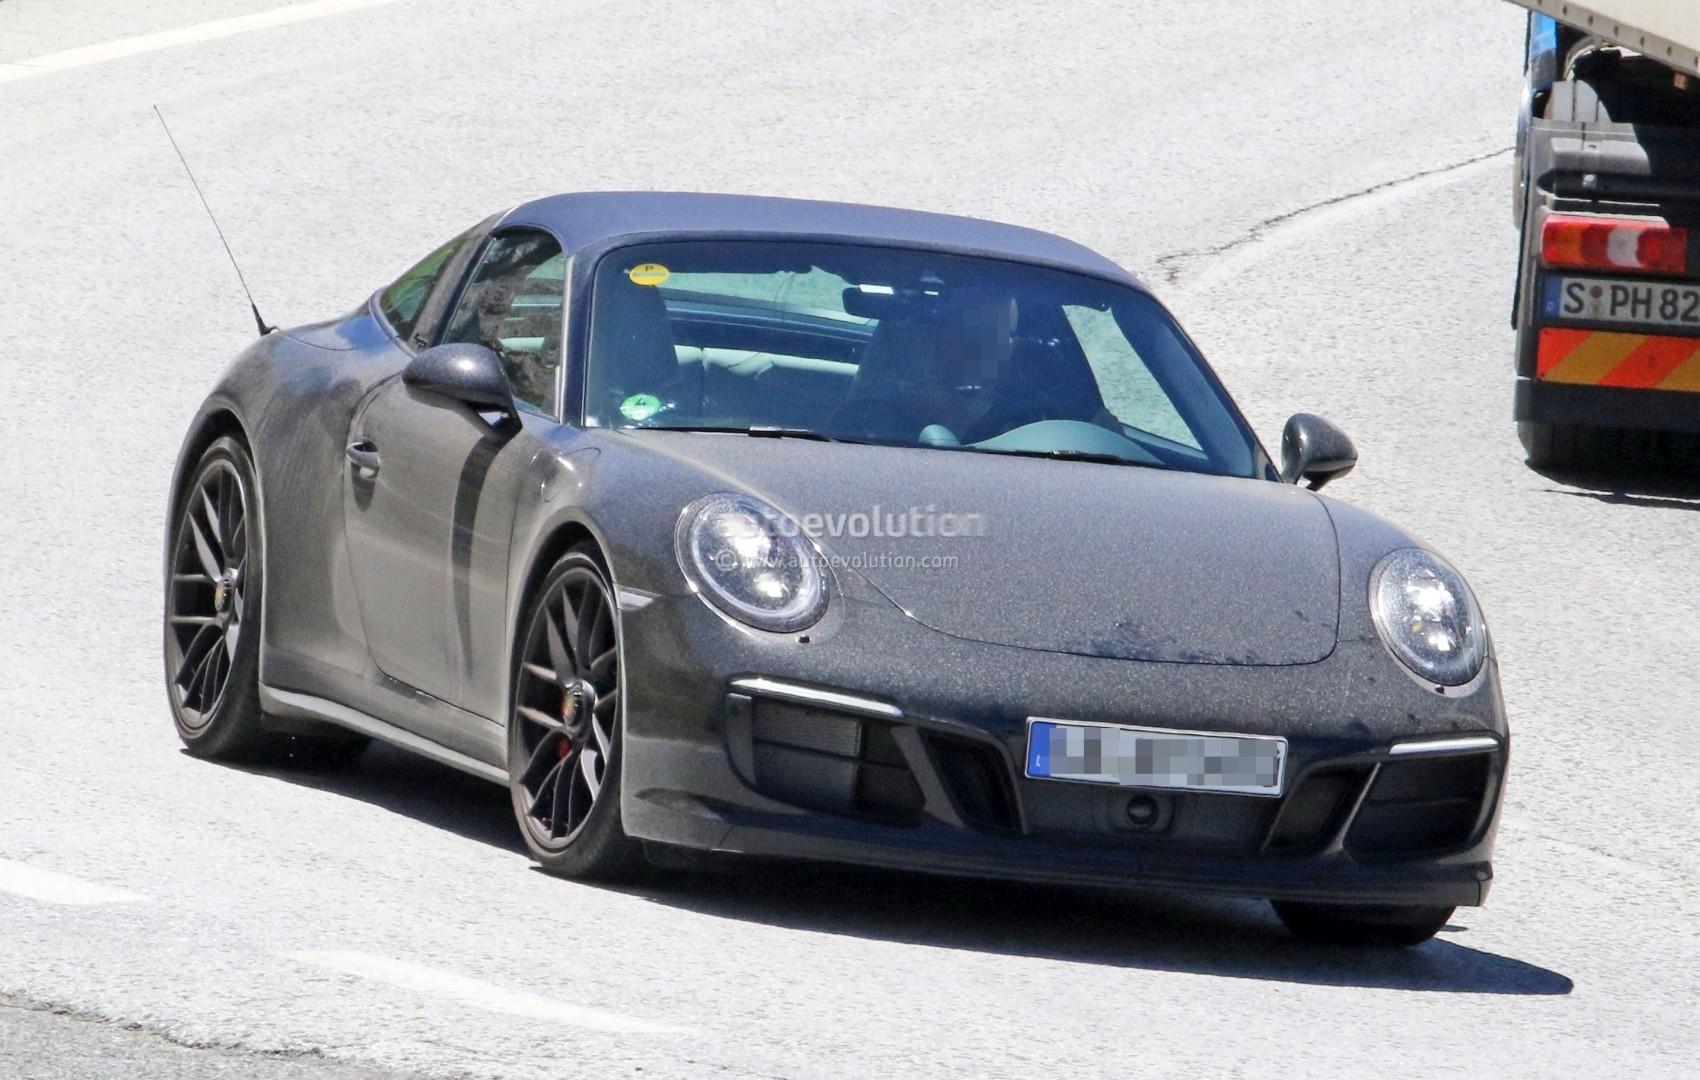 ... 2017 Porsche 911 Targa GTS 991.2 ... & 2017 Porsche 911 Targa GTS Revealed in Spyshots with Black Roof ... memphite.com